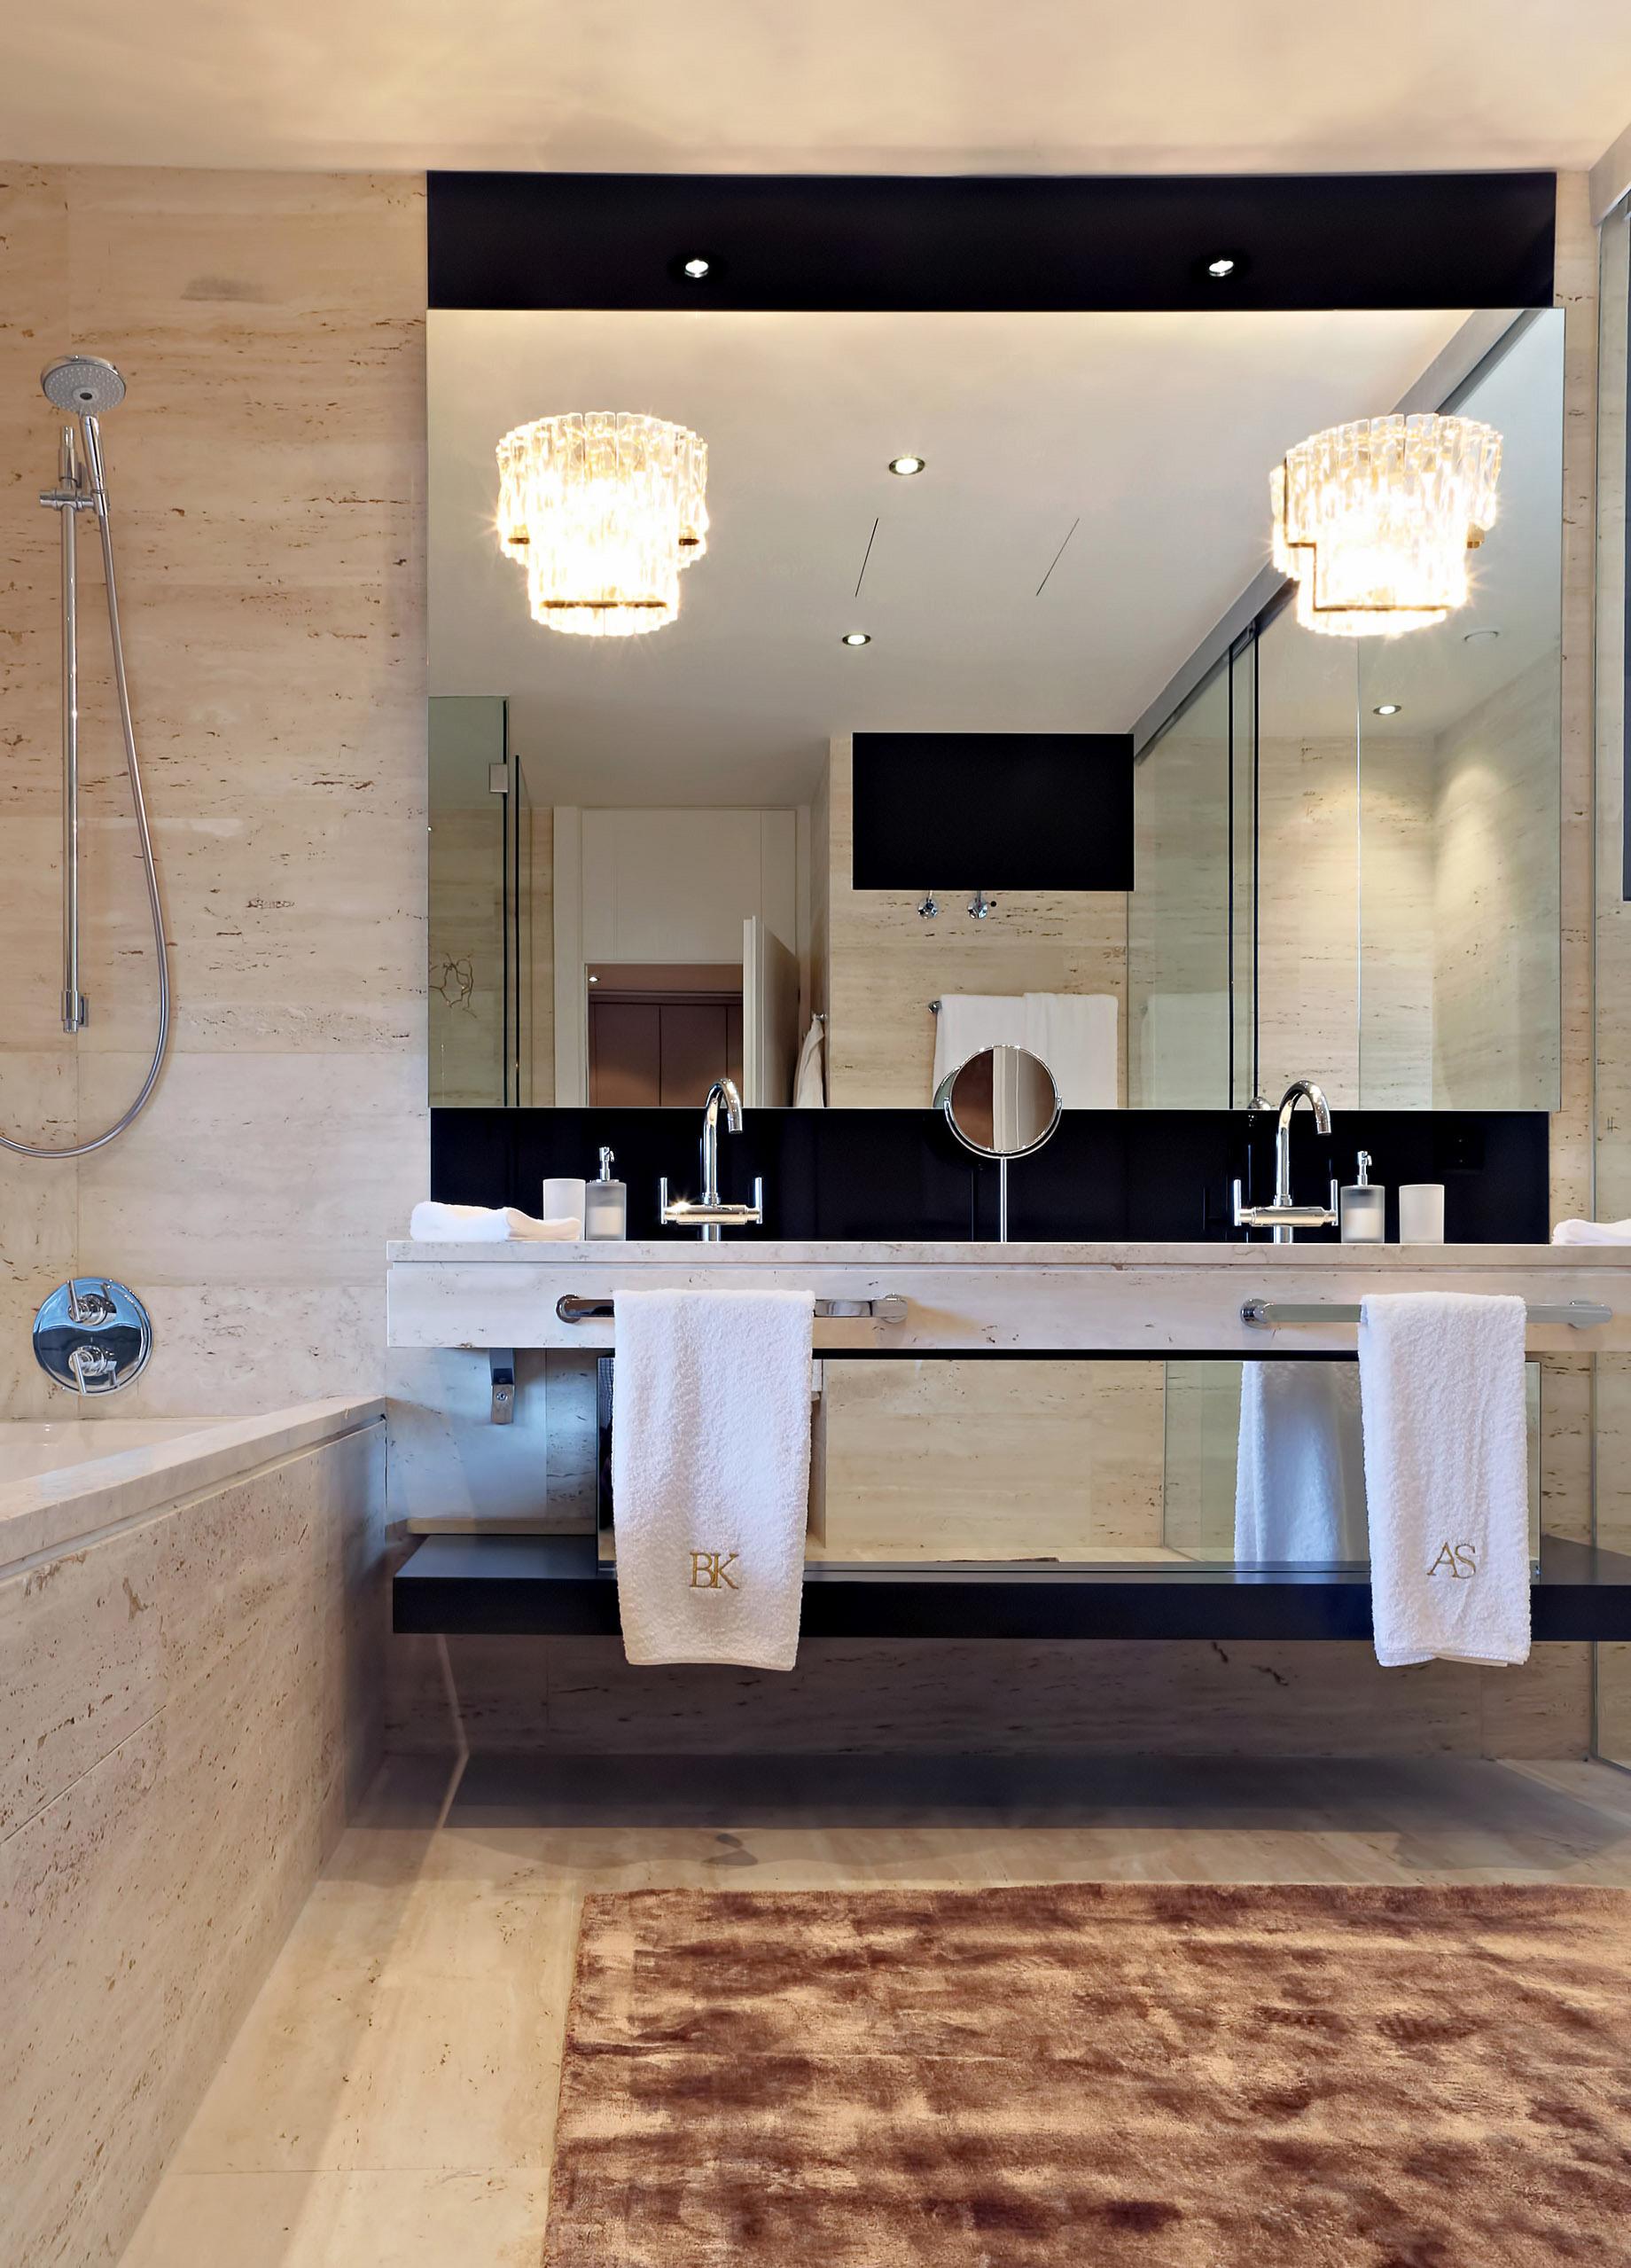 LV House Luxury Residence - Madrid, Spain